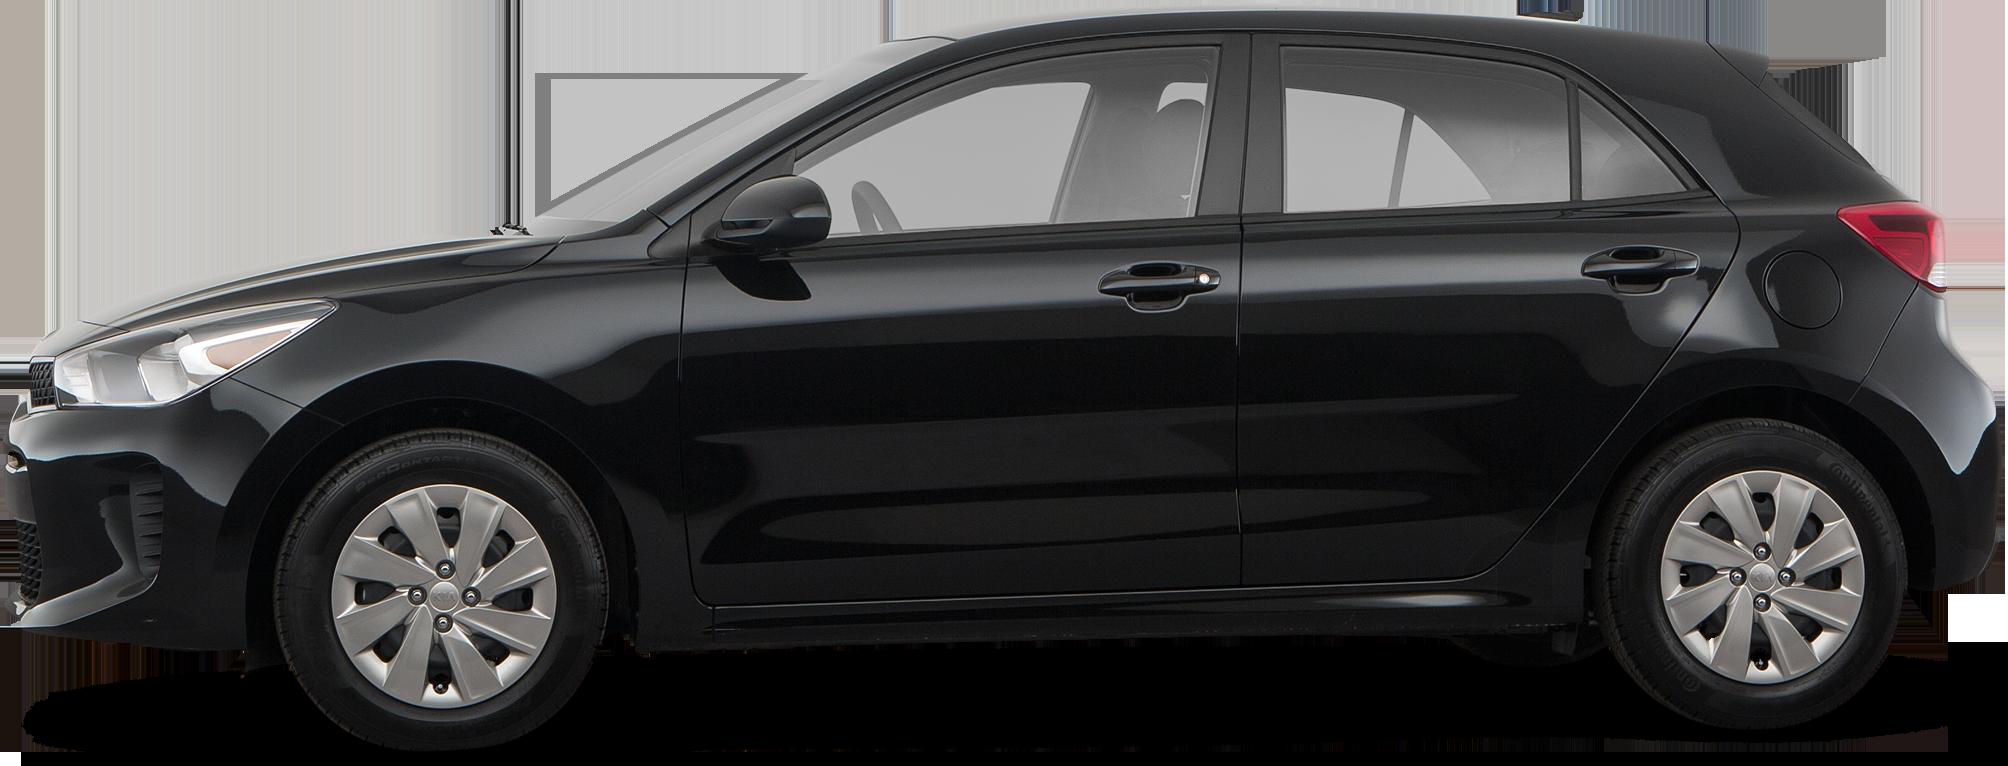 2020 Kia Rio Hatchback S